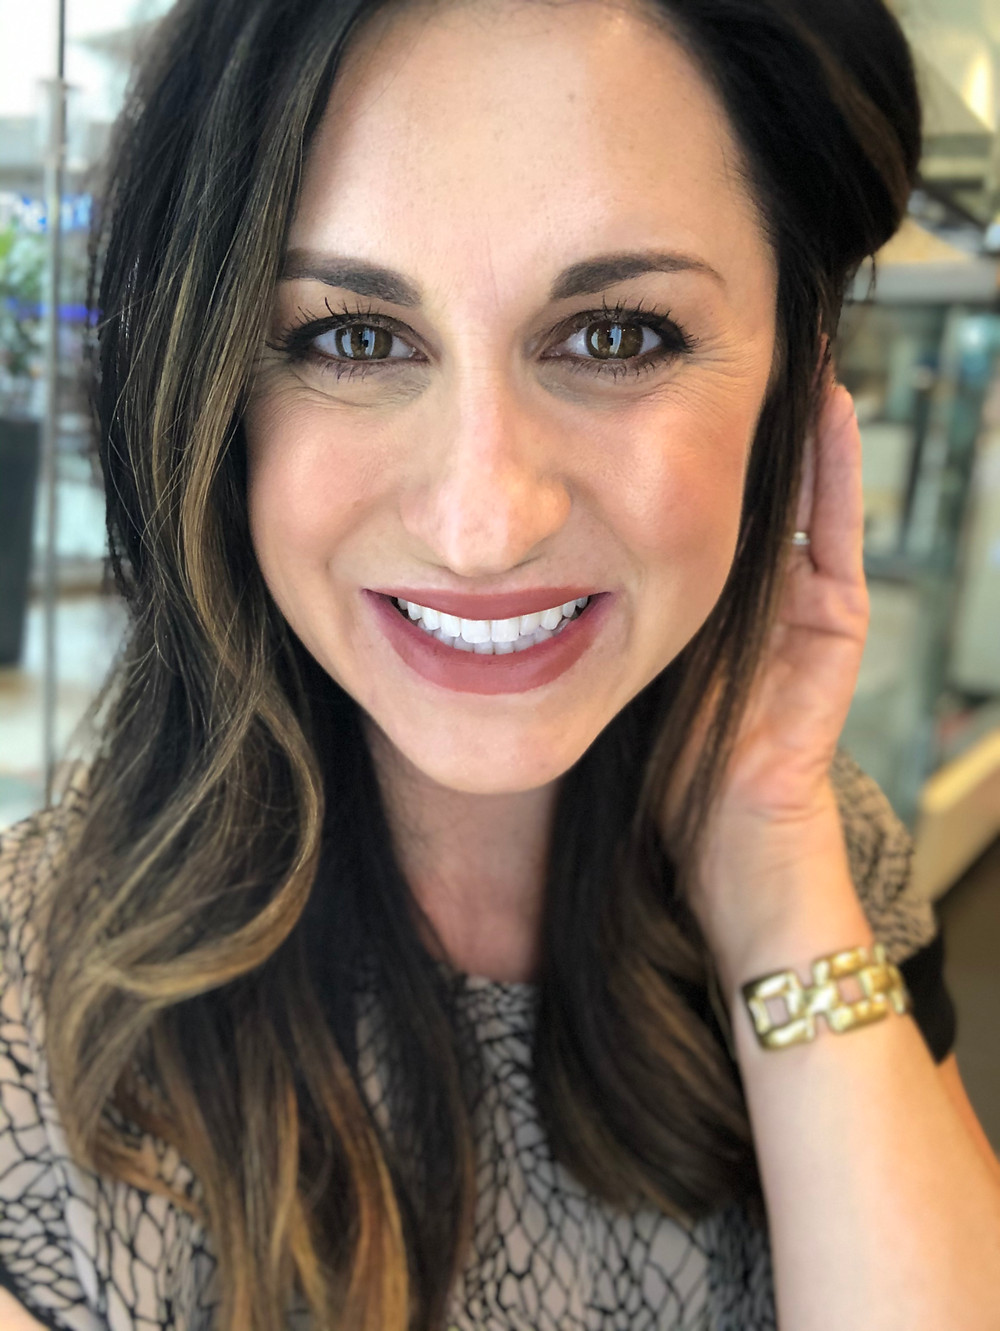 MAC Lipstick Taupe OKC Blogger Courtney Garrison